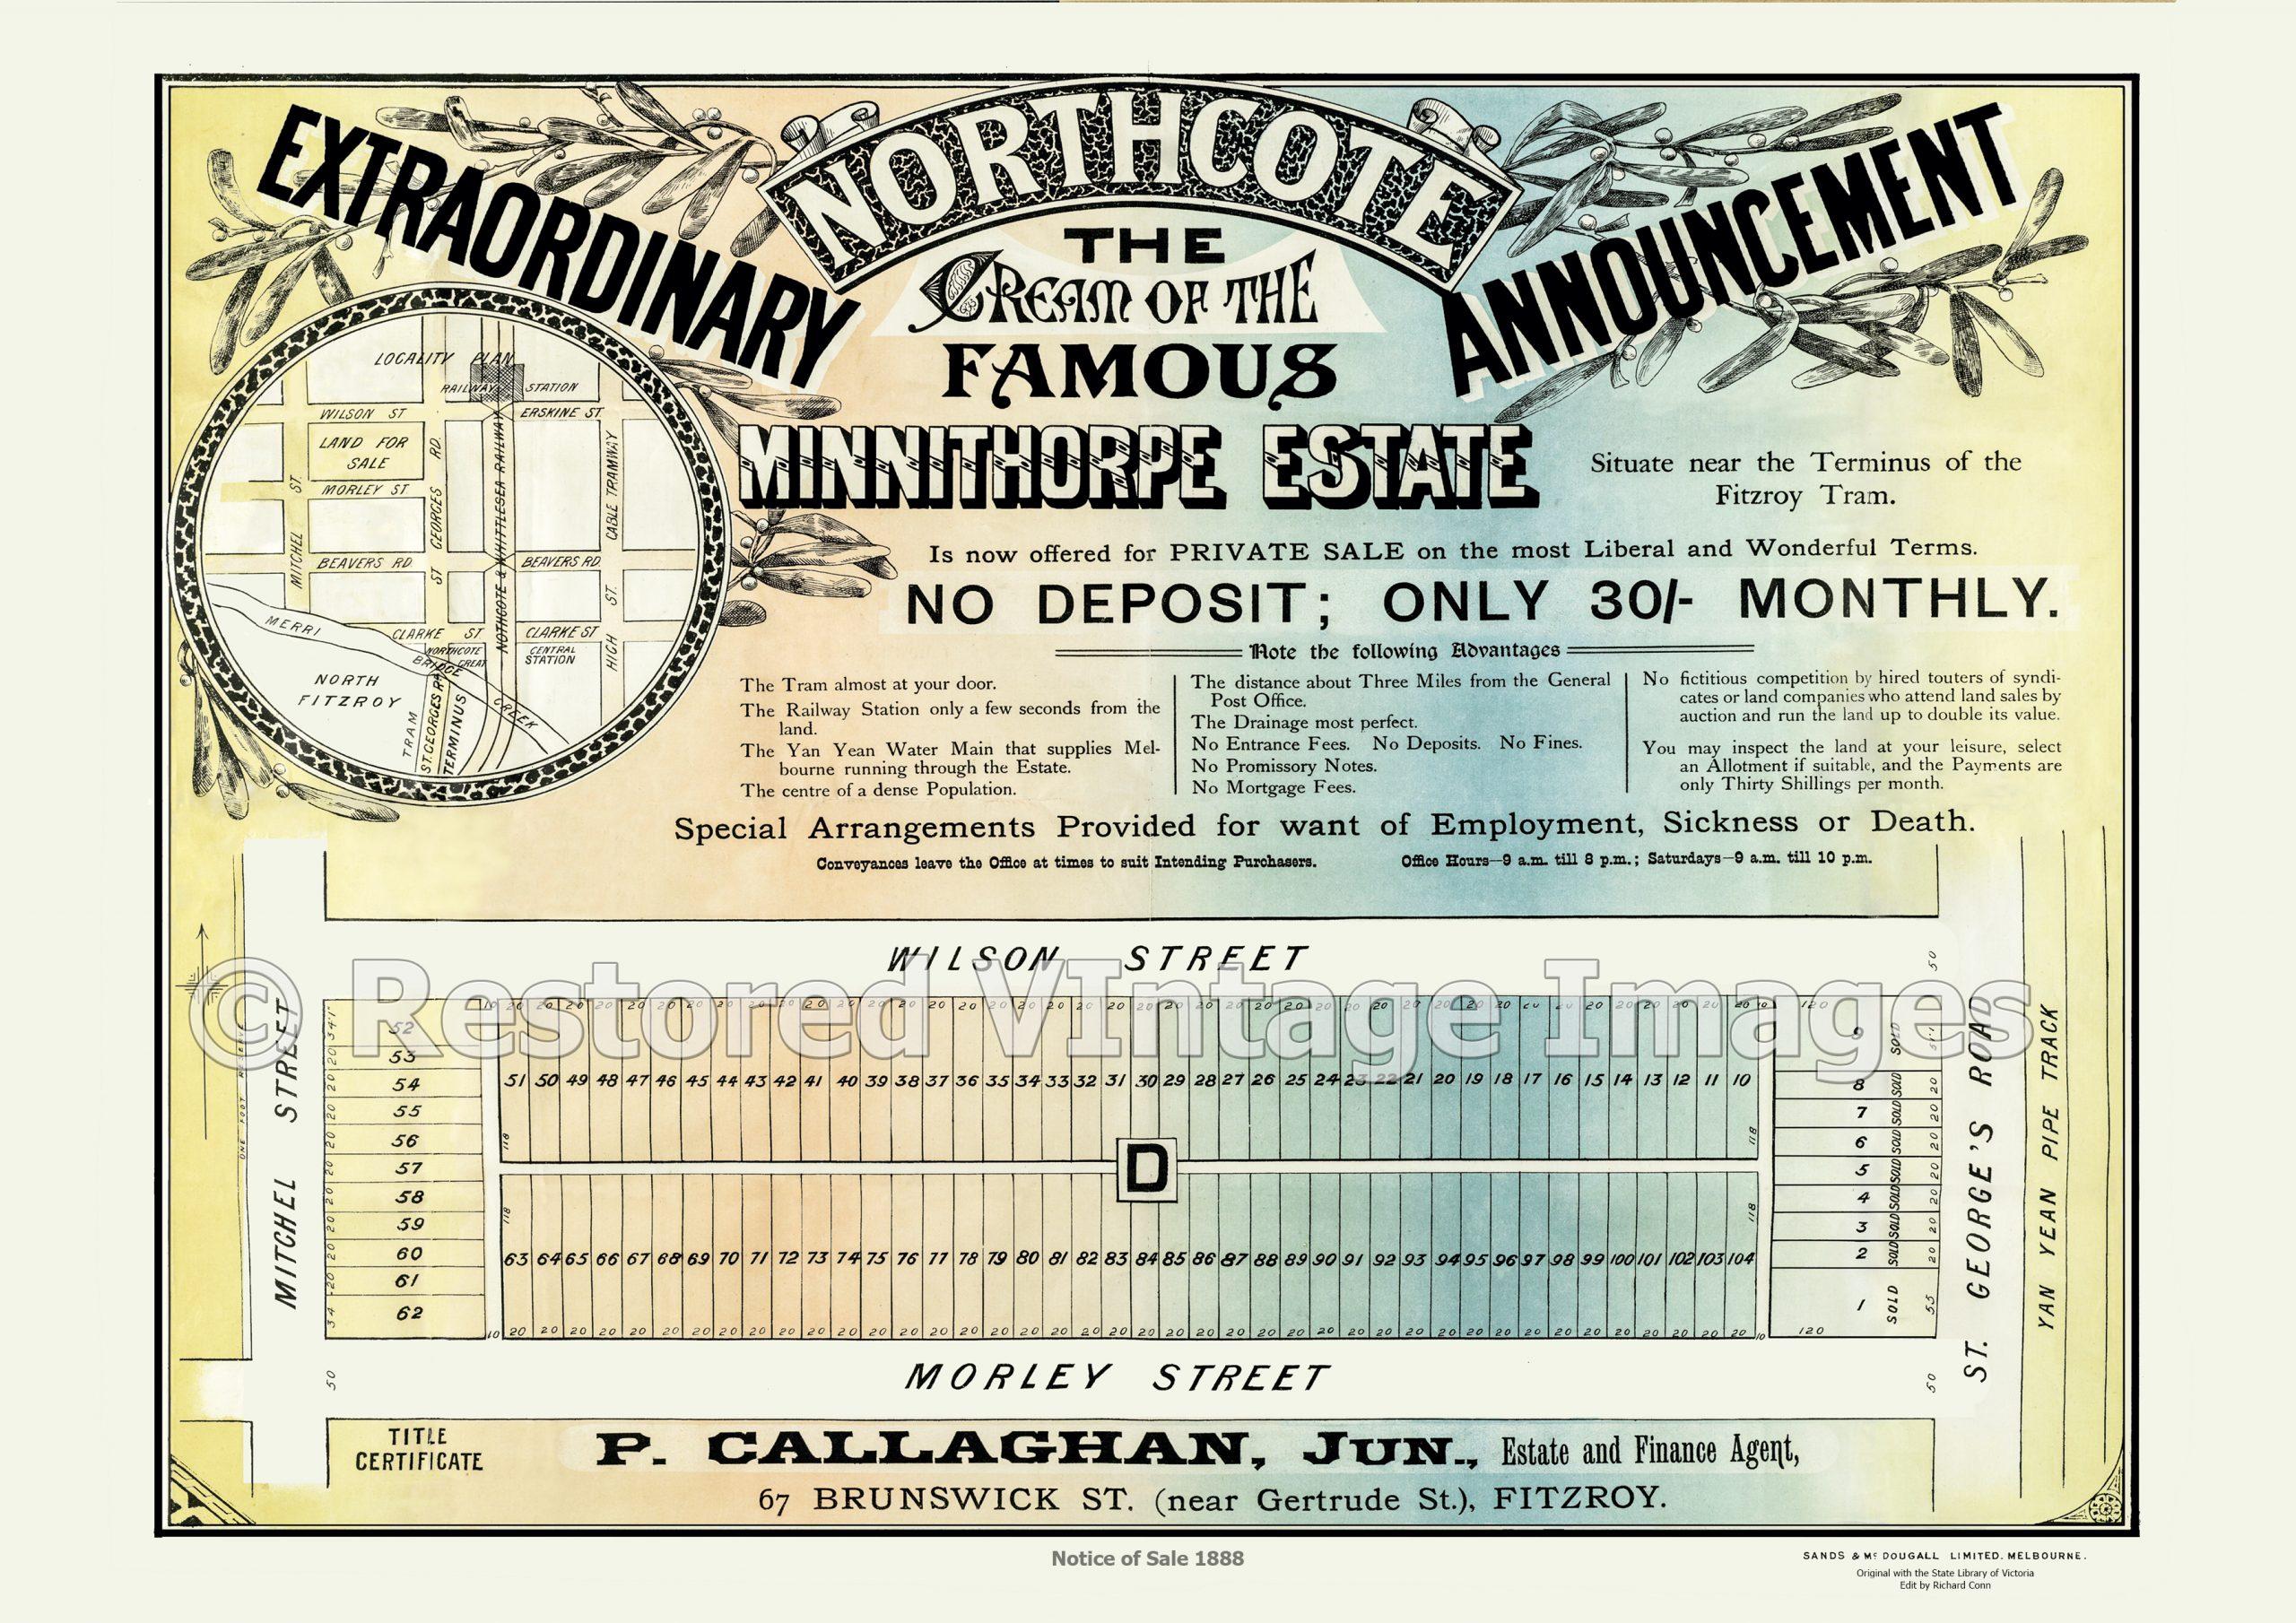 Minnithorpe Estate 1888 – Northcote